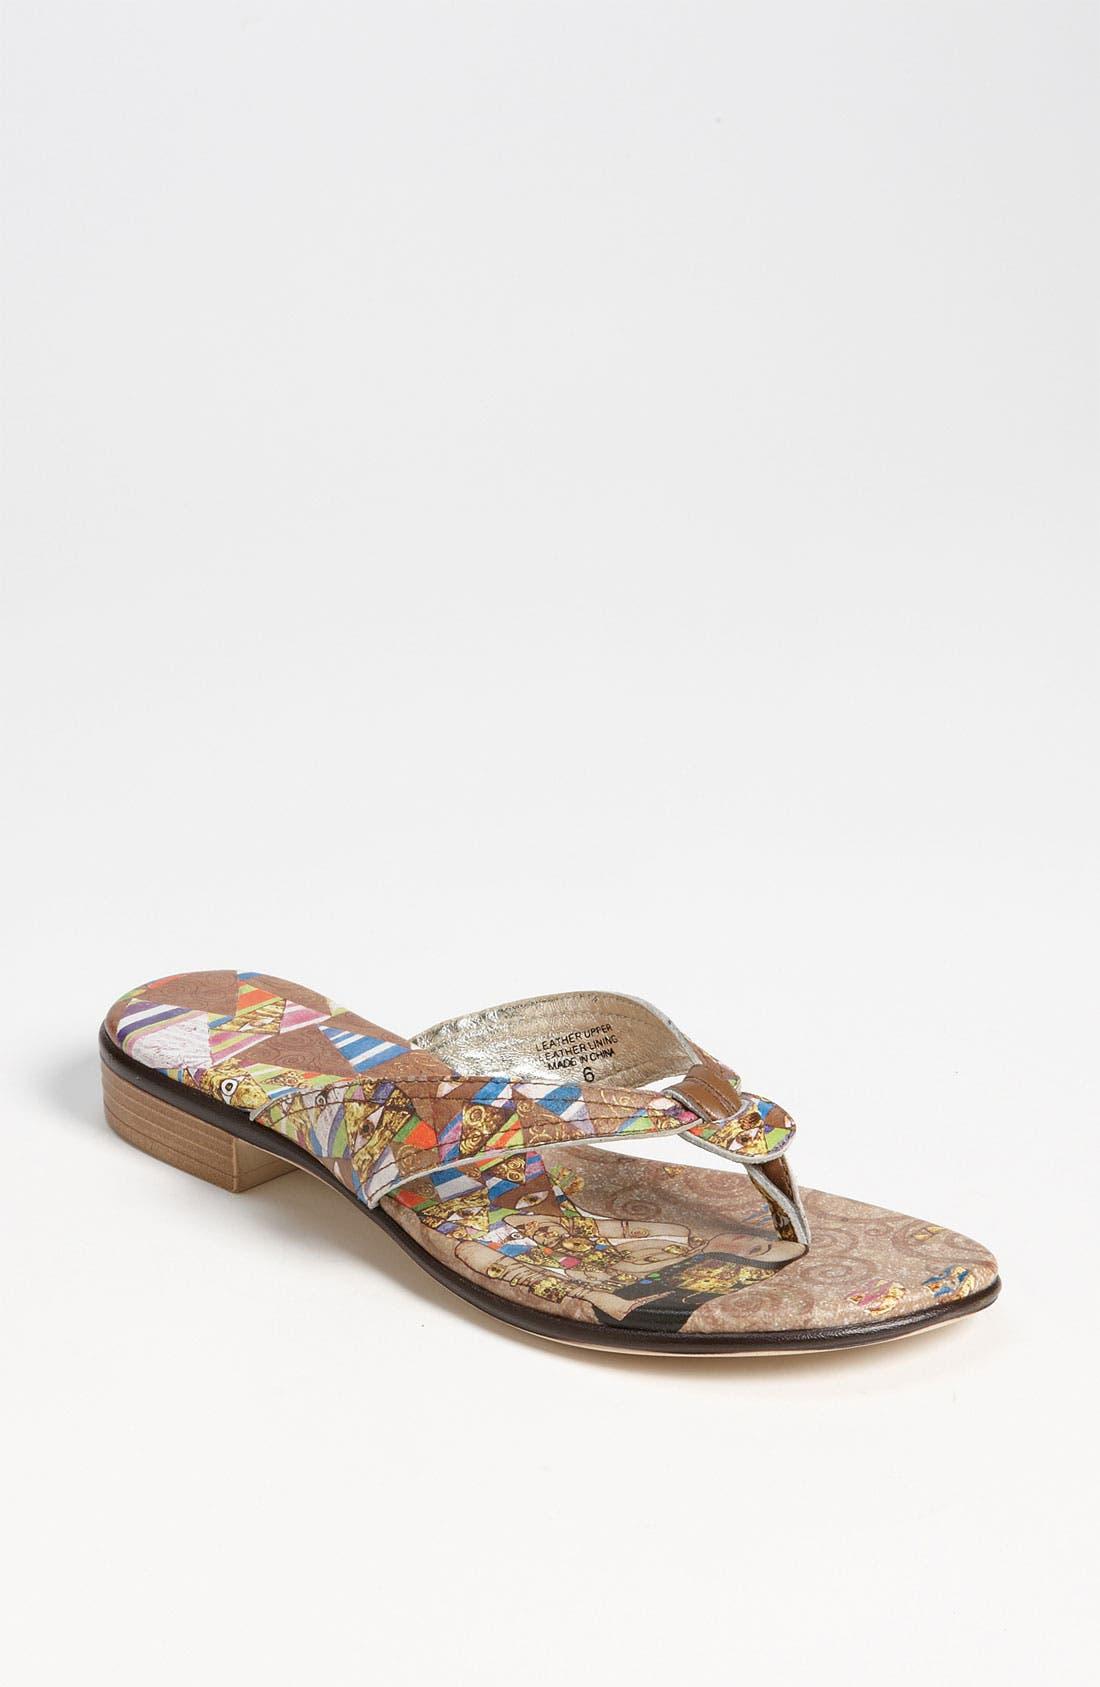 Main Image - Icon 'Jada 23' Sandal